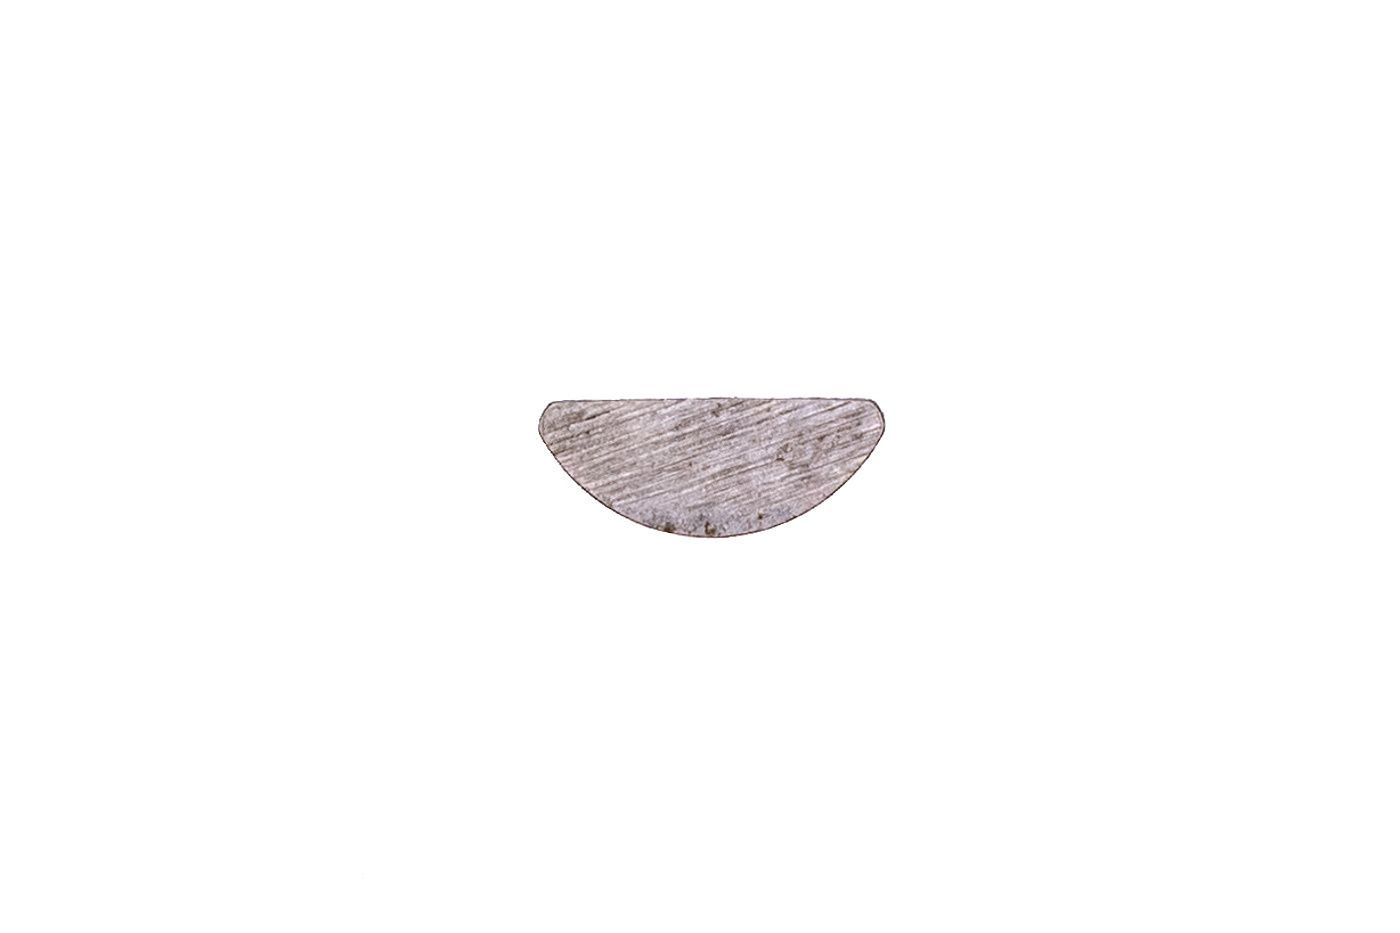 Klin ventilátora Stihl MS440 MS660 MS661 - 2x3.7 - 1120 036 8500